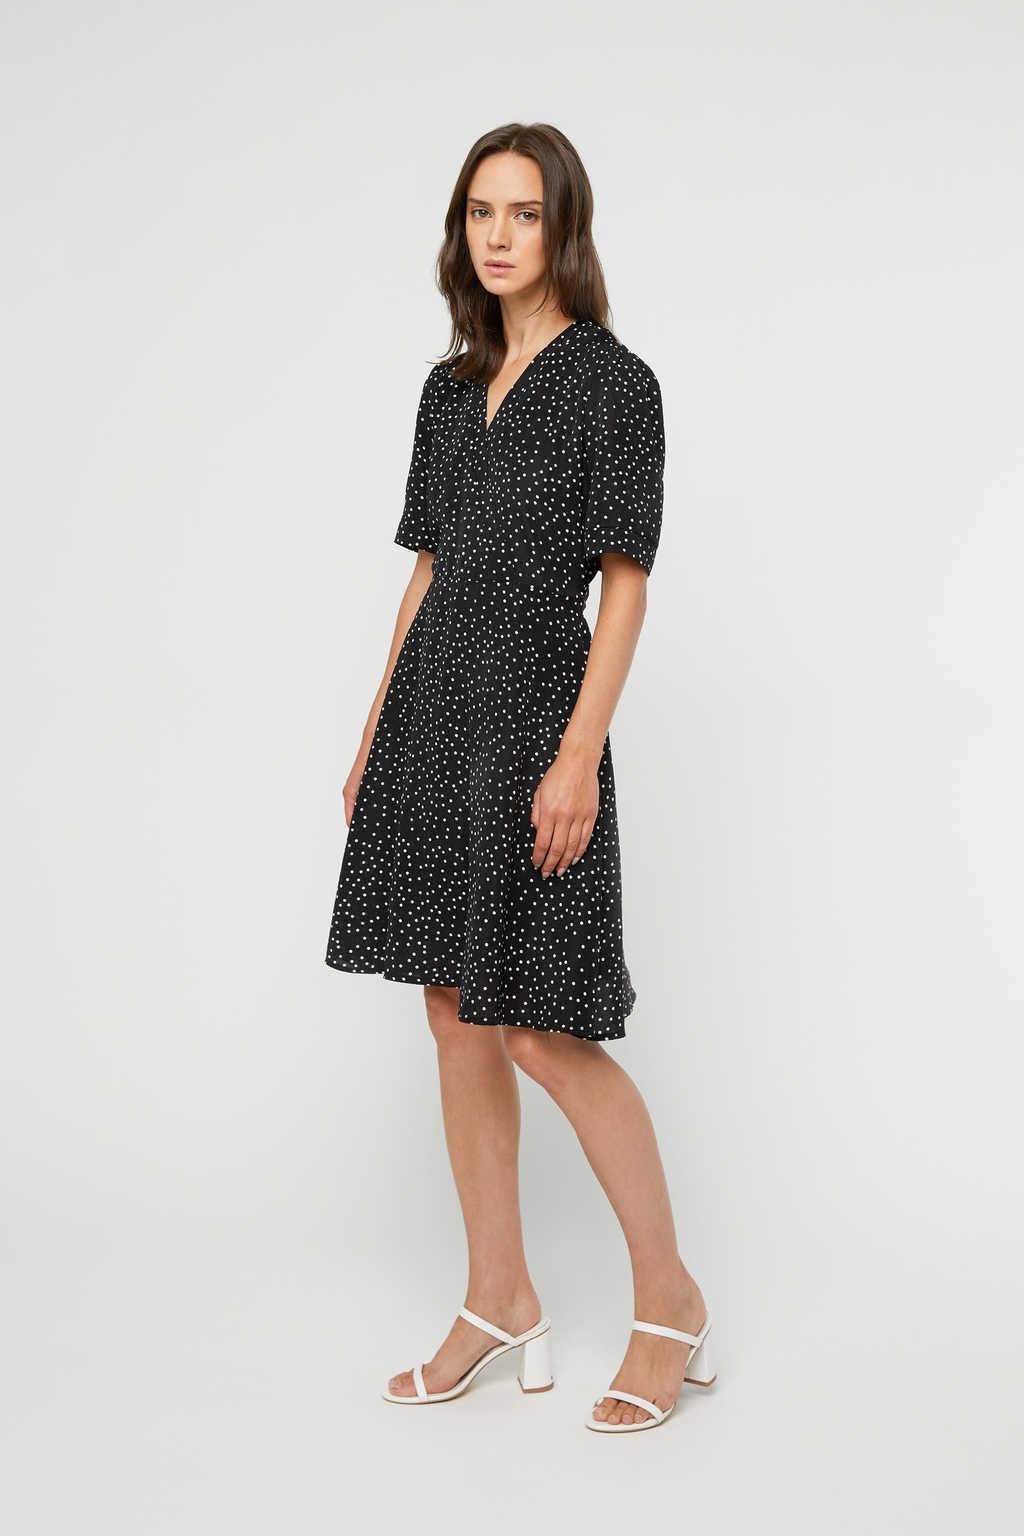 Dress K026 Black 3